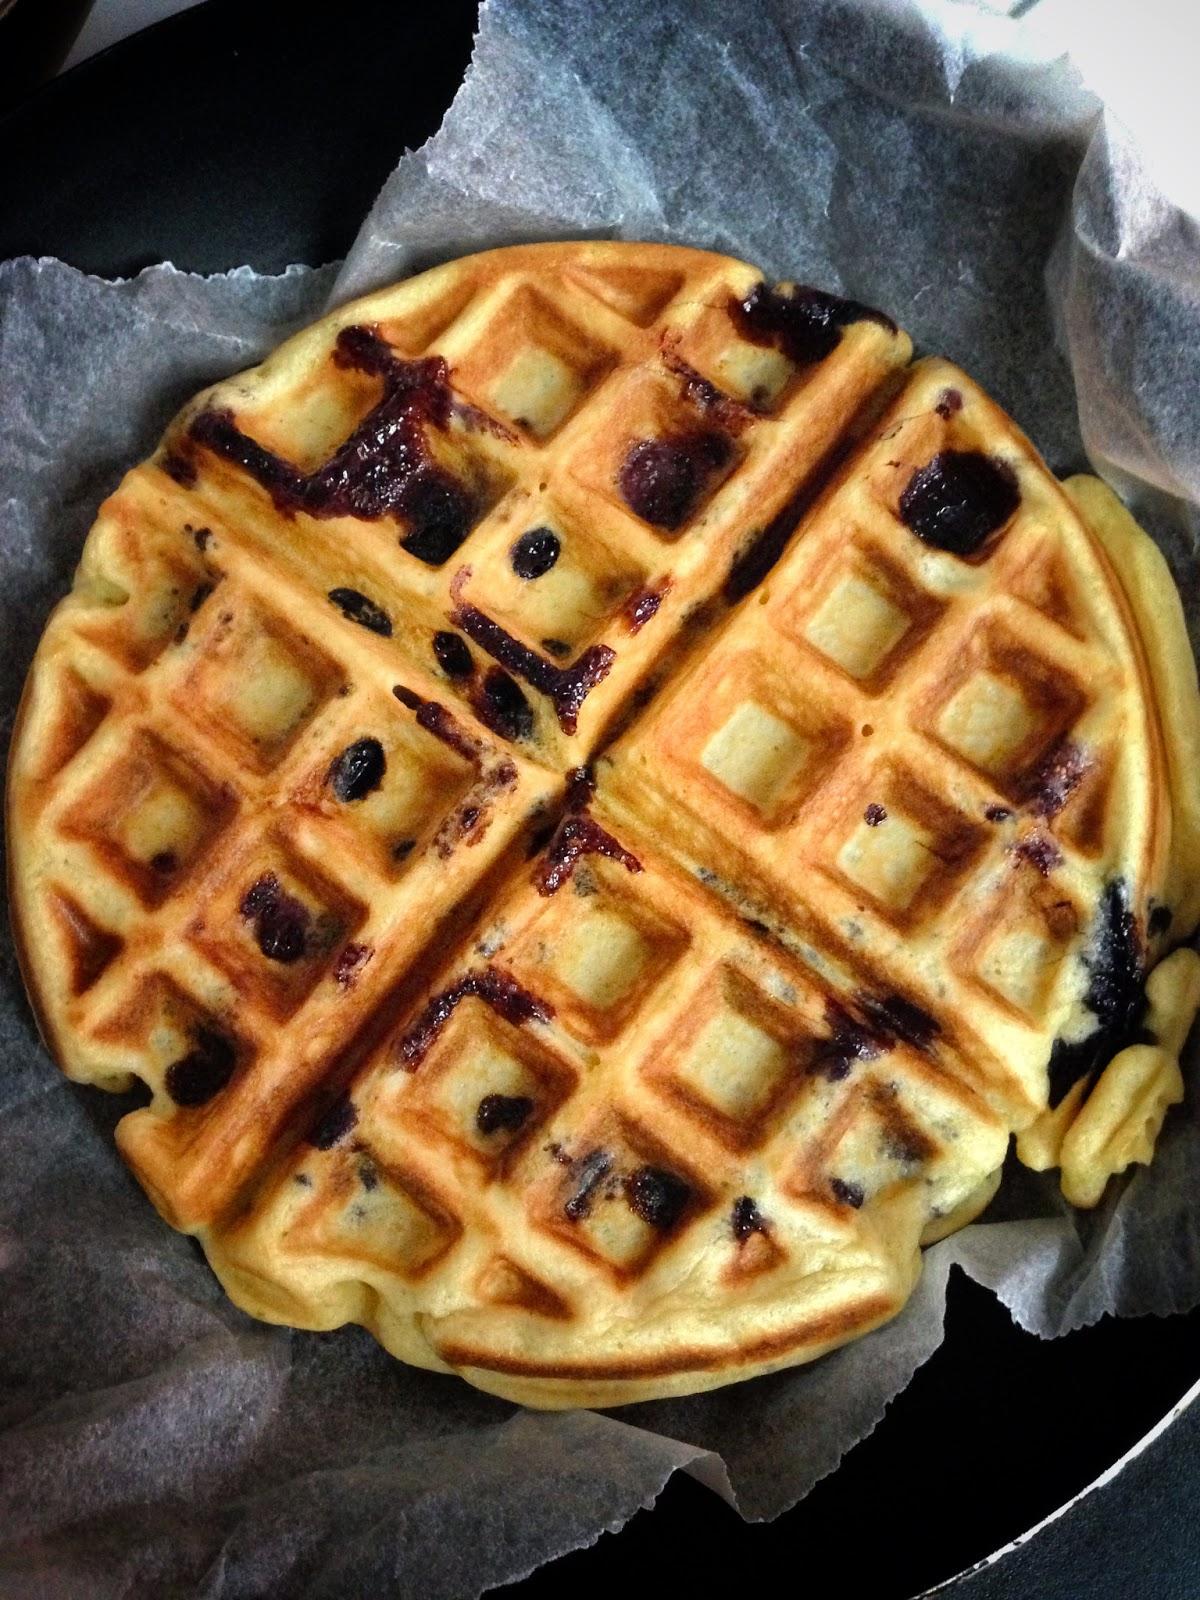 The Humble Hostess: [鬆餅機大挑戰 #2]檸檬藍莓鬆餅 Lemon Blueberry Waffle